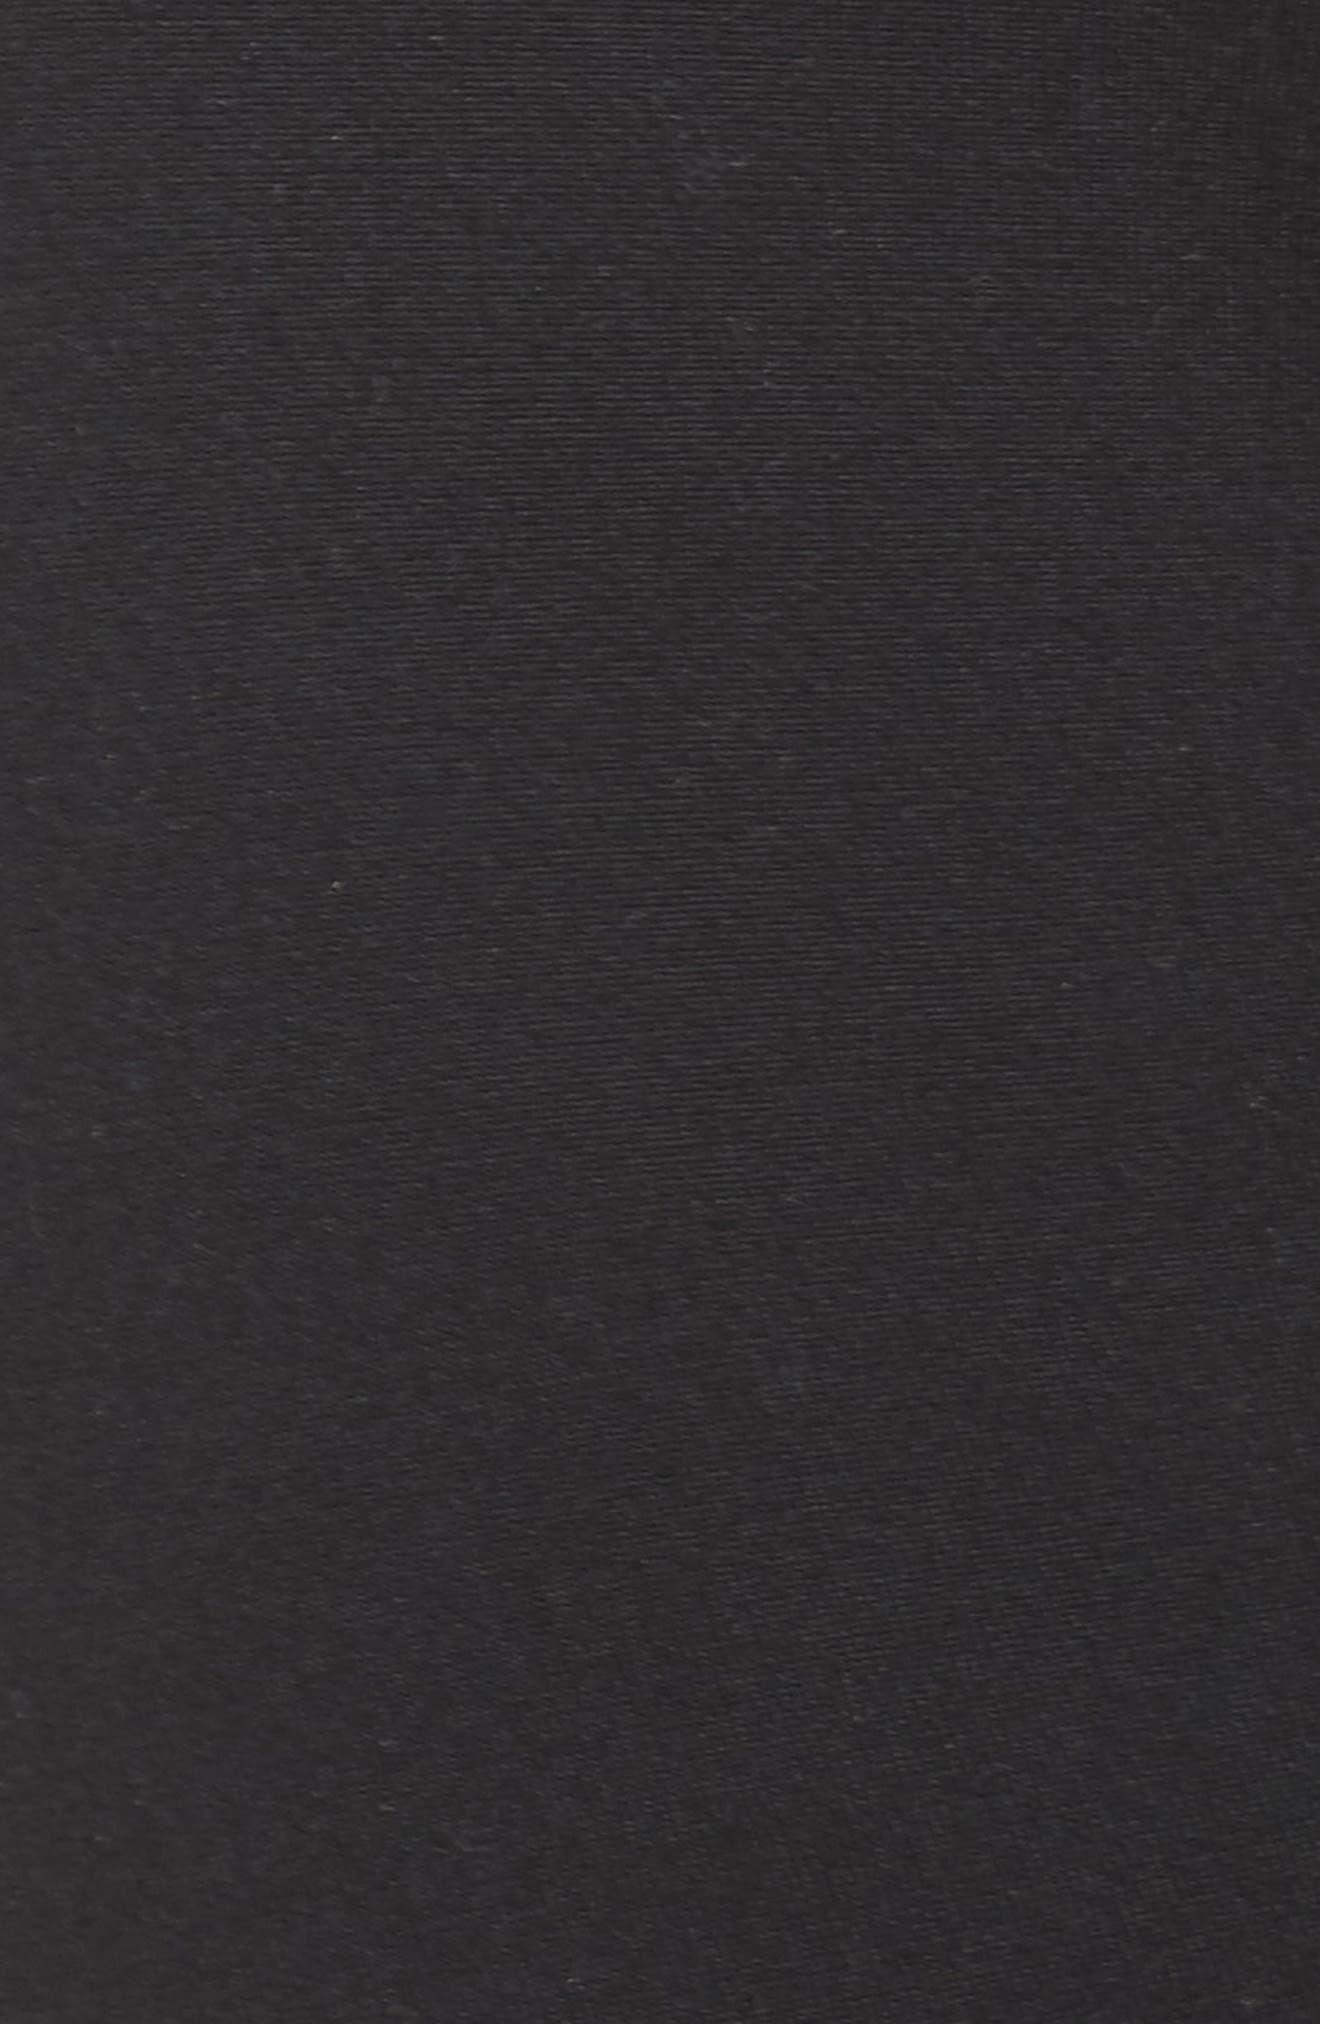 Prismatic High Waist Leggings,                             Alternate thumbnail 6, color,                             002